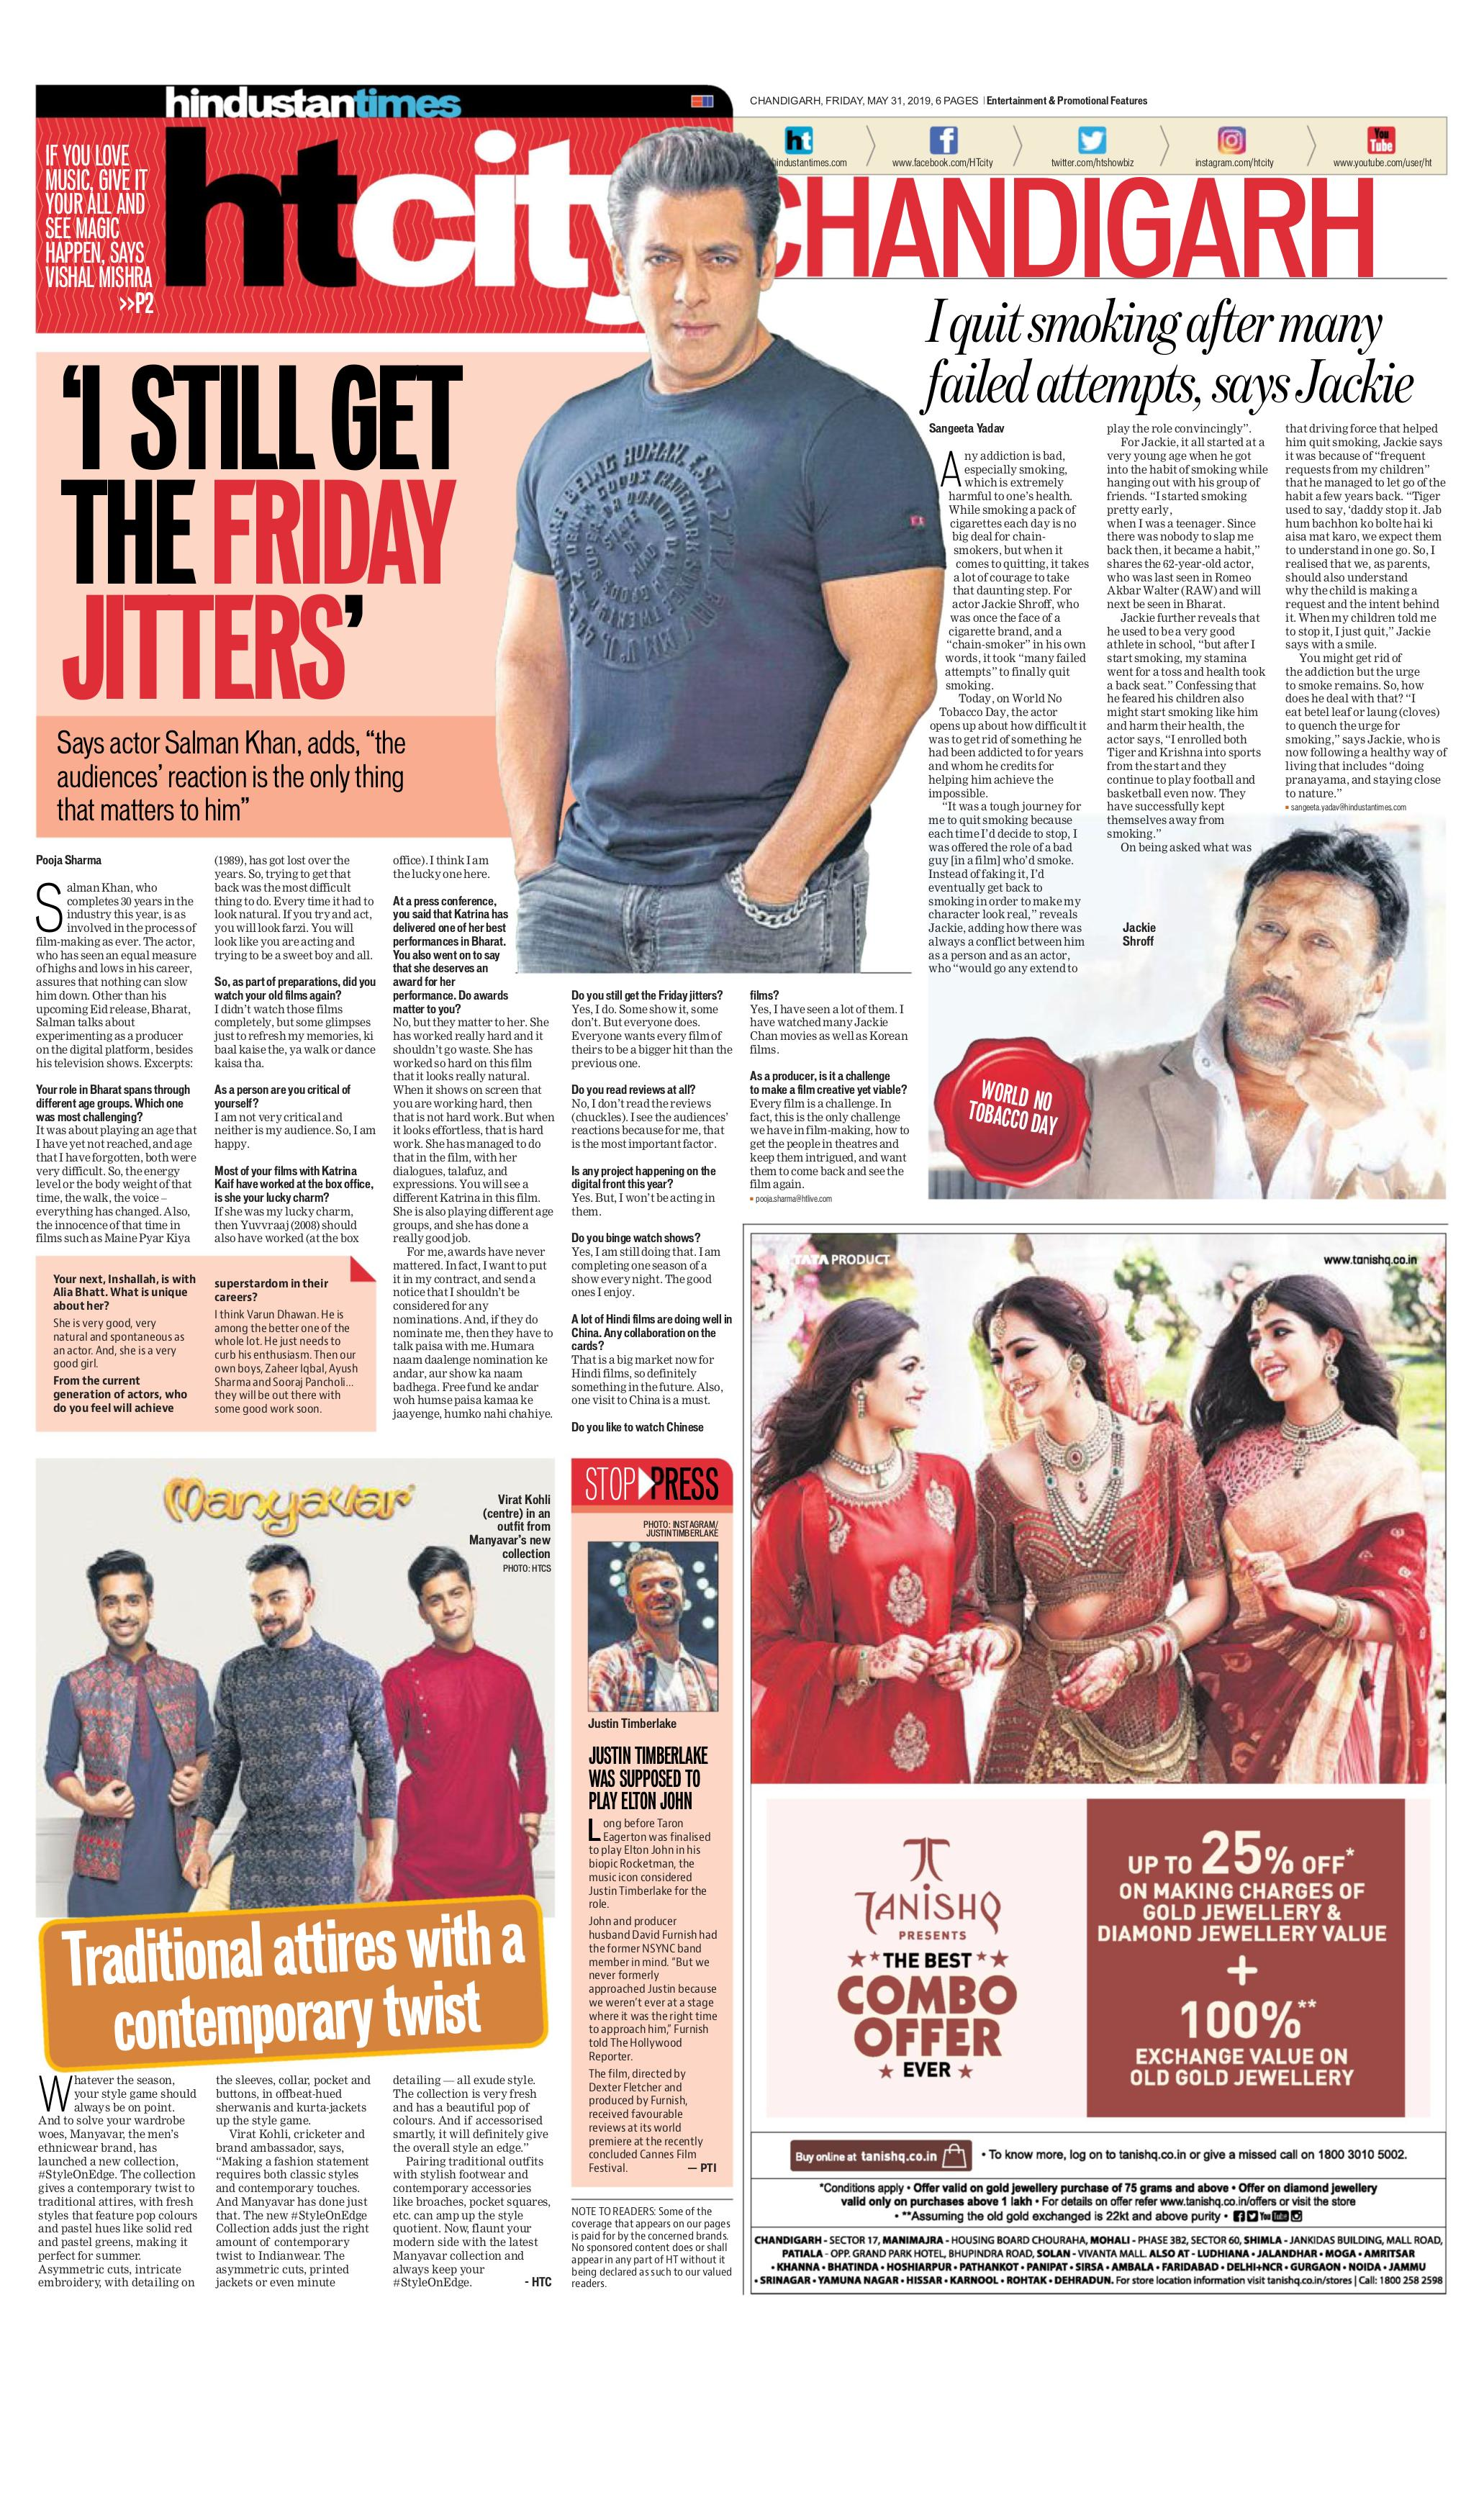 Hindustan Times Chandigarh - May 31, 2019 Digital Magazine